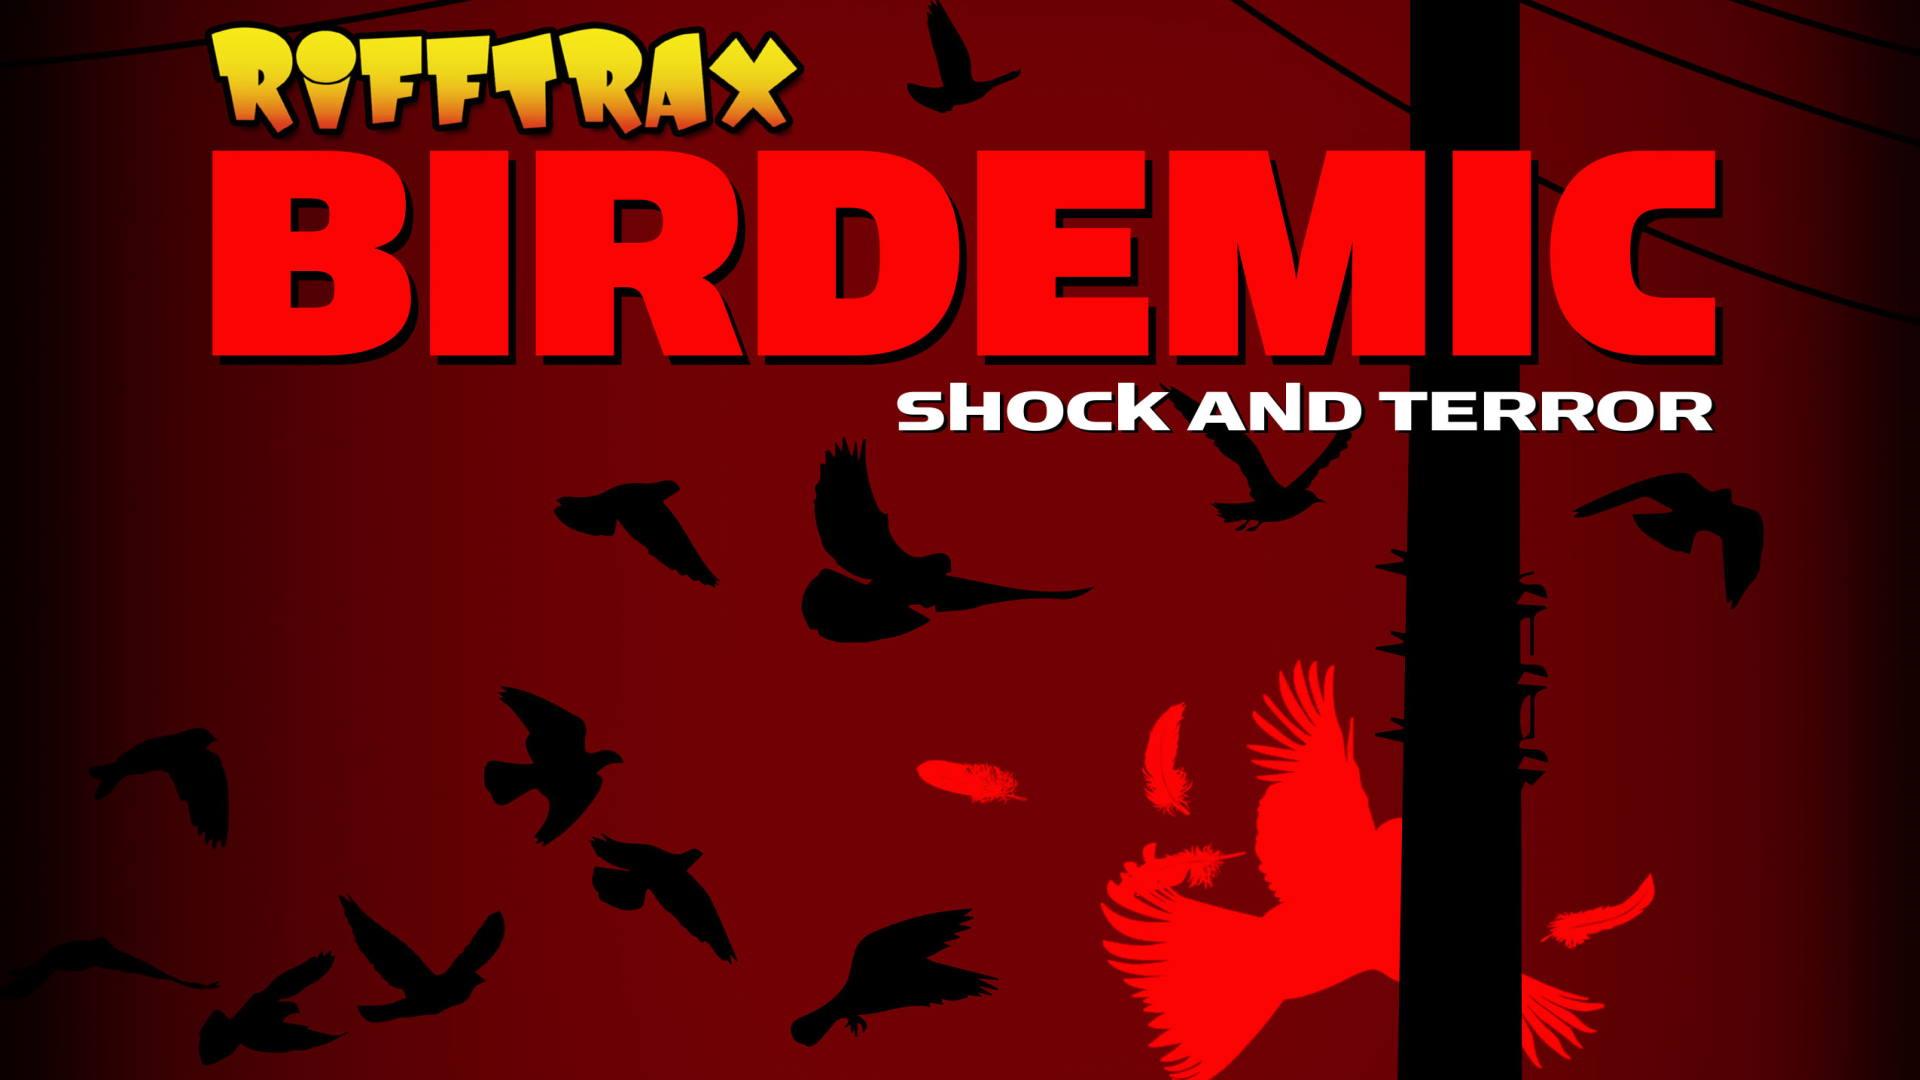 Rifftrax: Birdemic